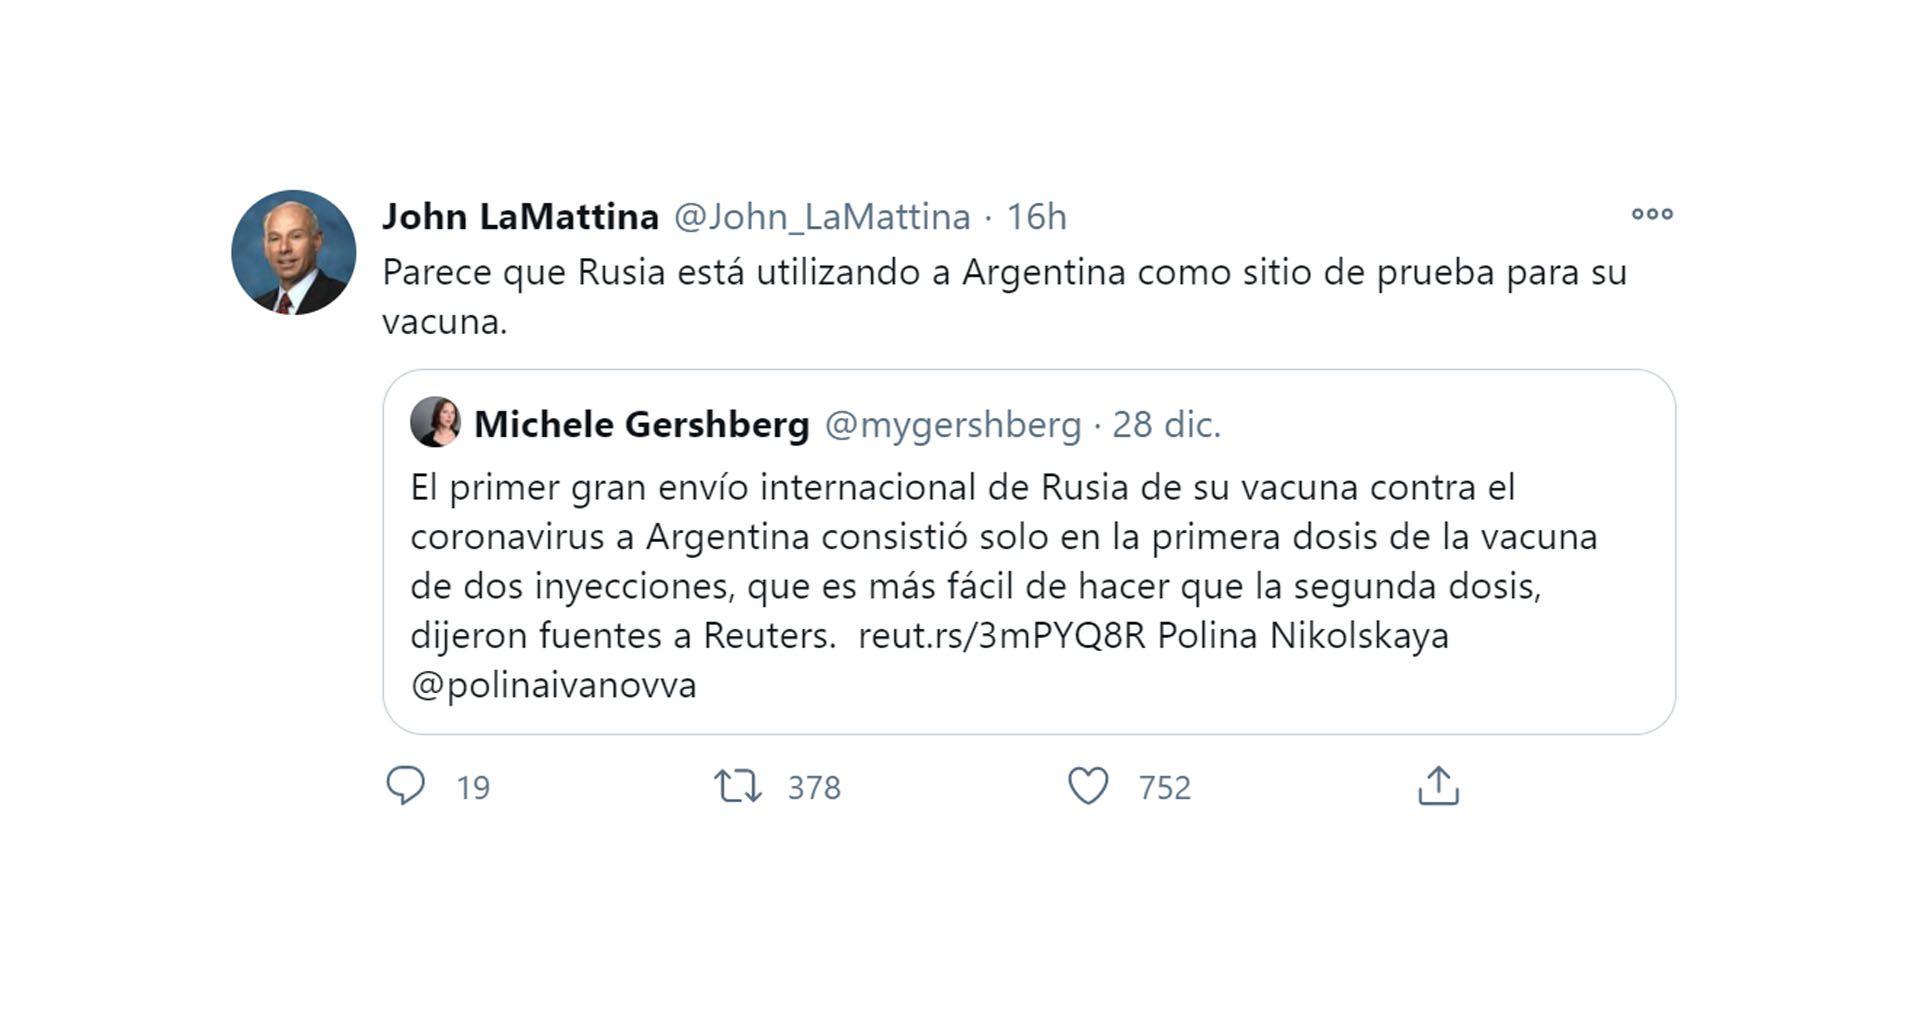 john la mattina tuit vacuna sputnik 5 argentina traducido